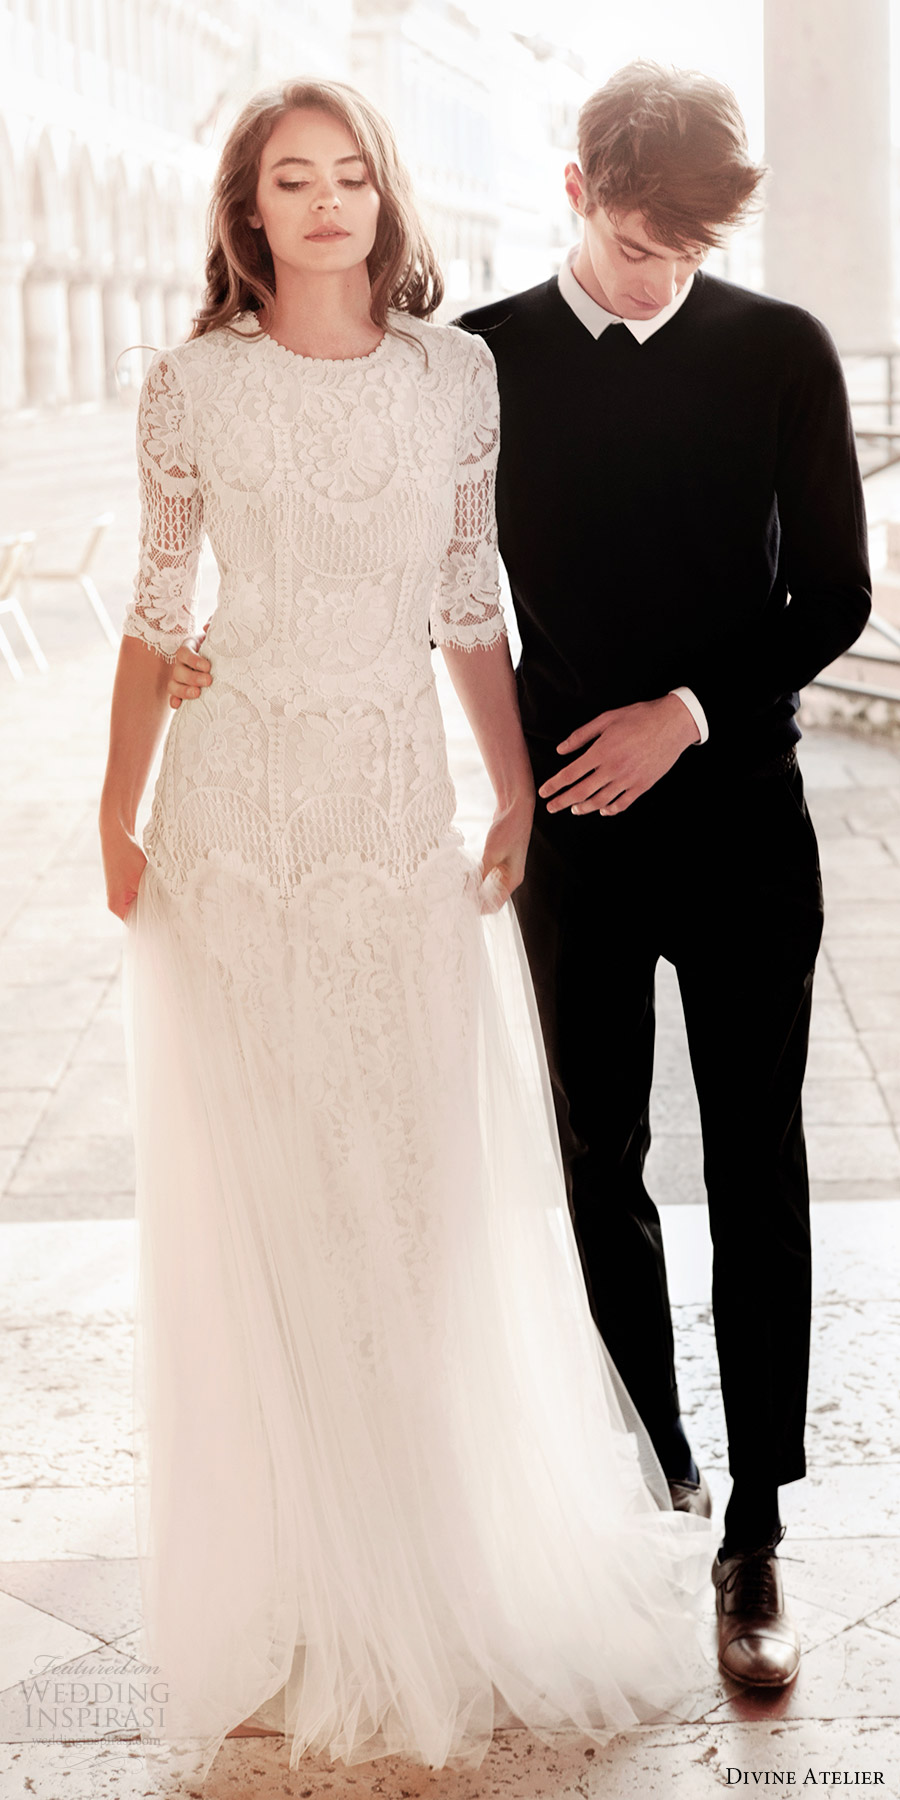 Divine atelier 2017 wedding dresses wedding inspirasi for How to become a wedding dress model